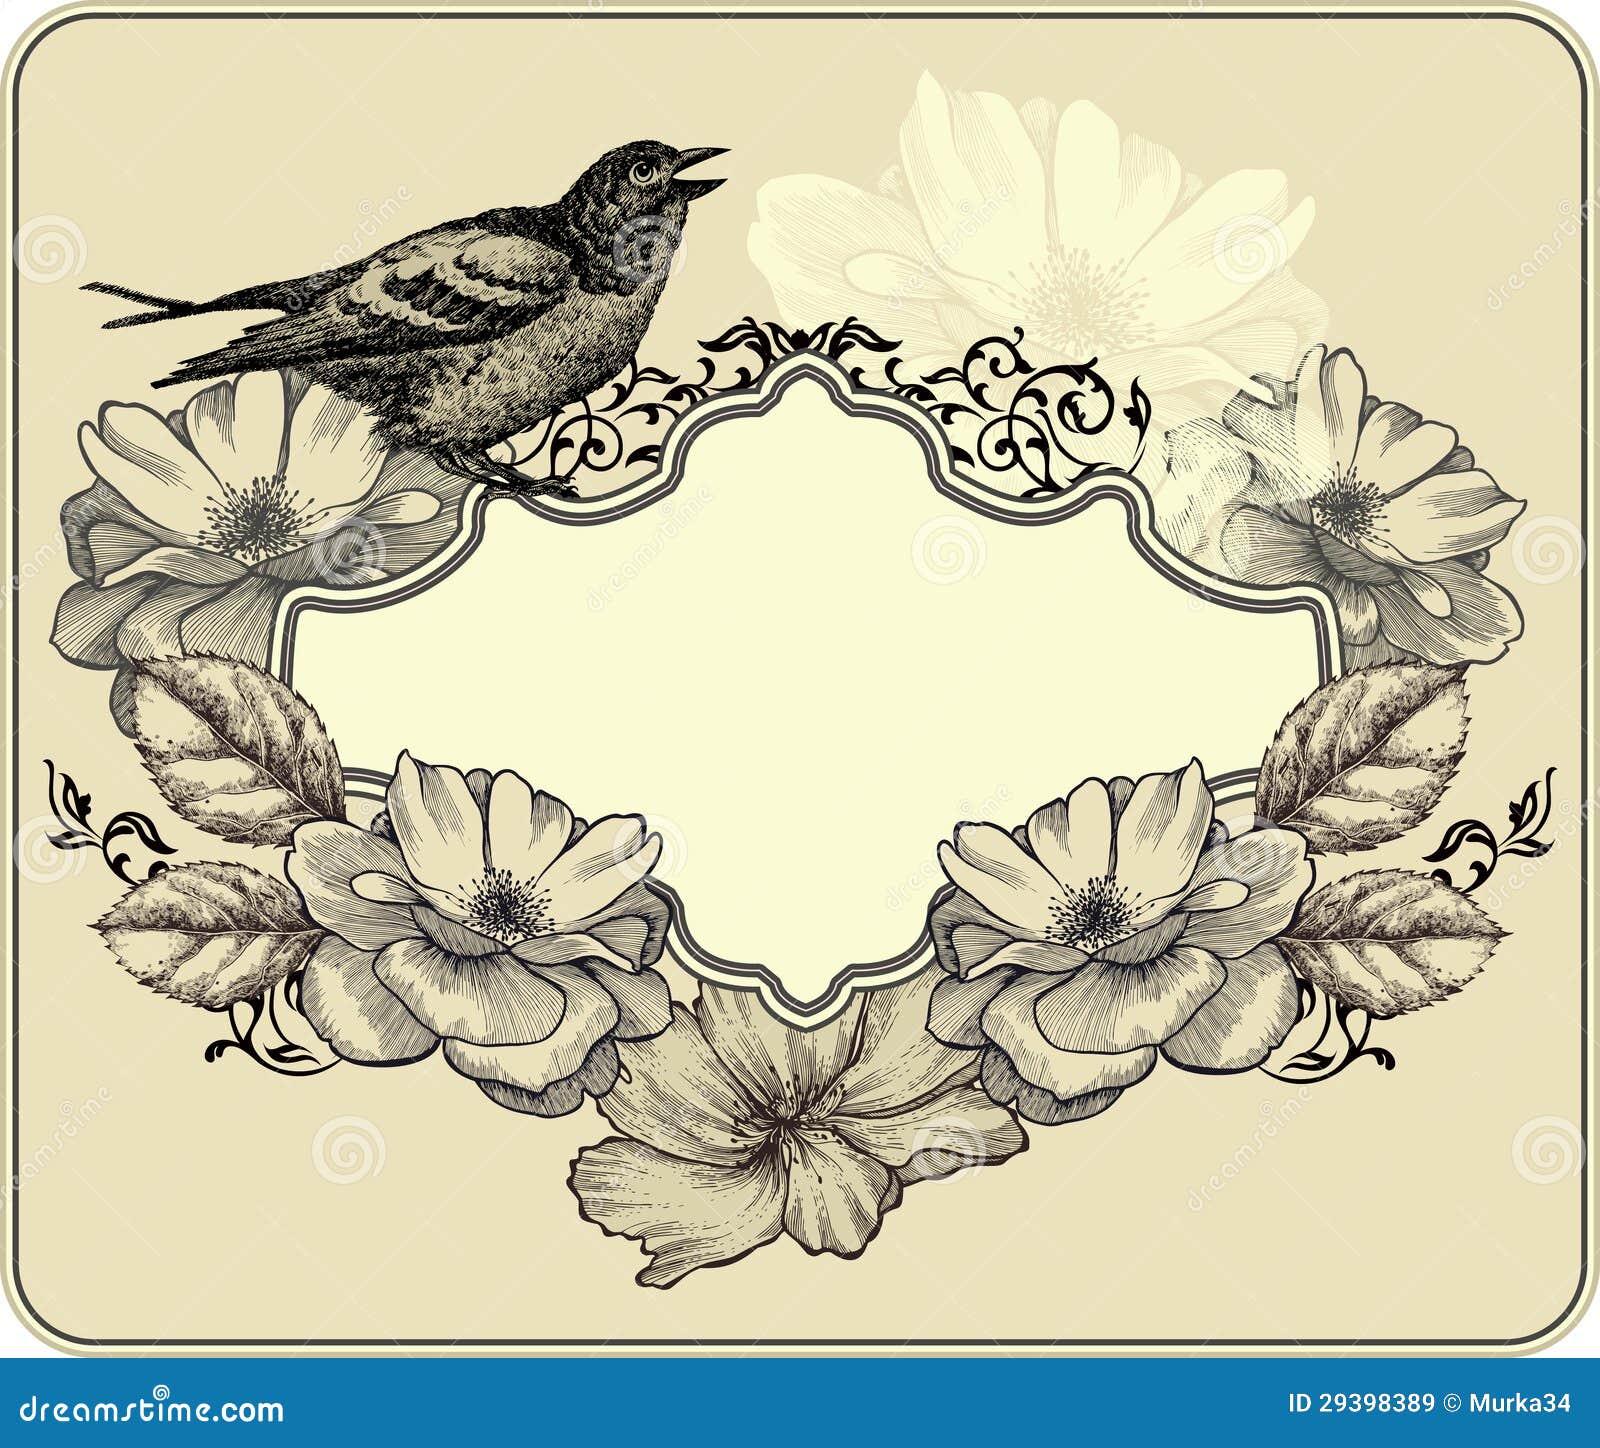 Vintage bird vector free download - photo#3